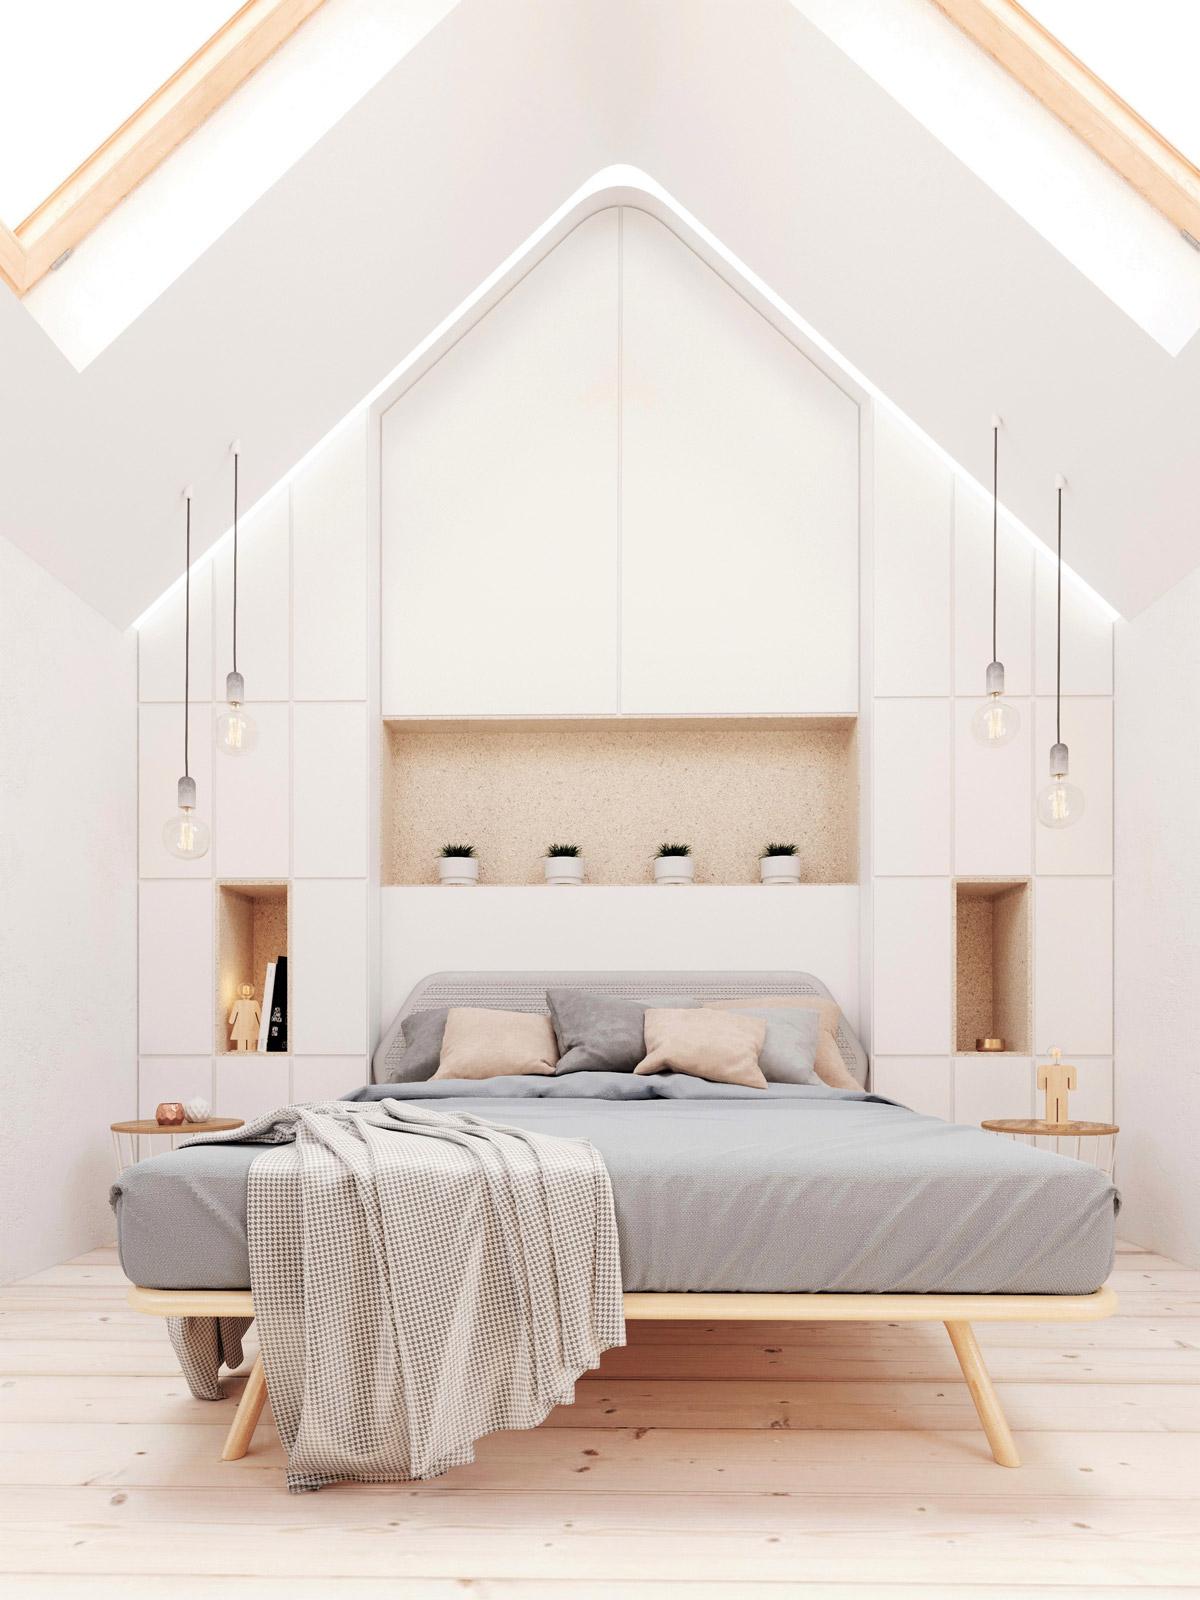 Minimalist Bedroom With Unique Ceiling